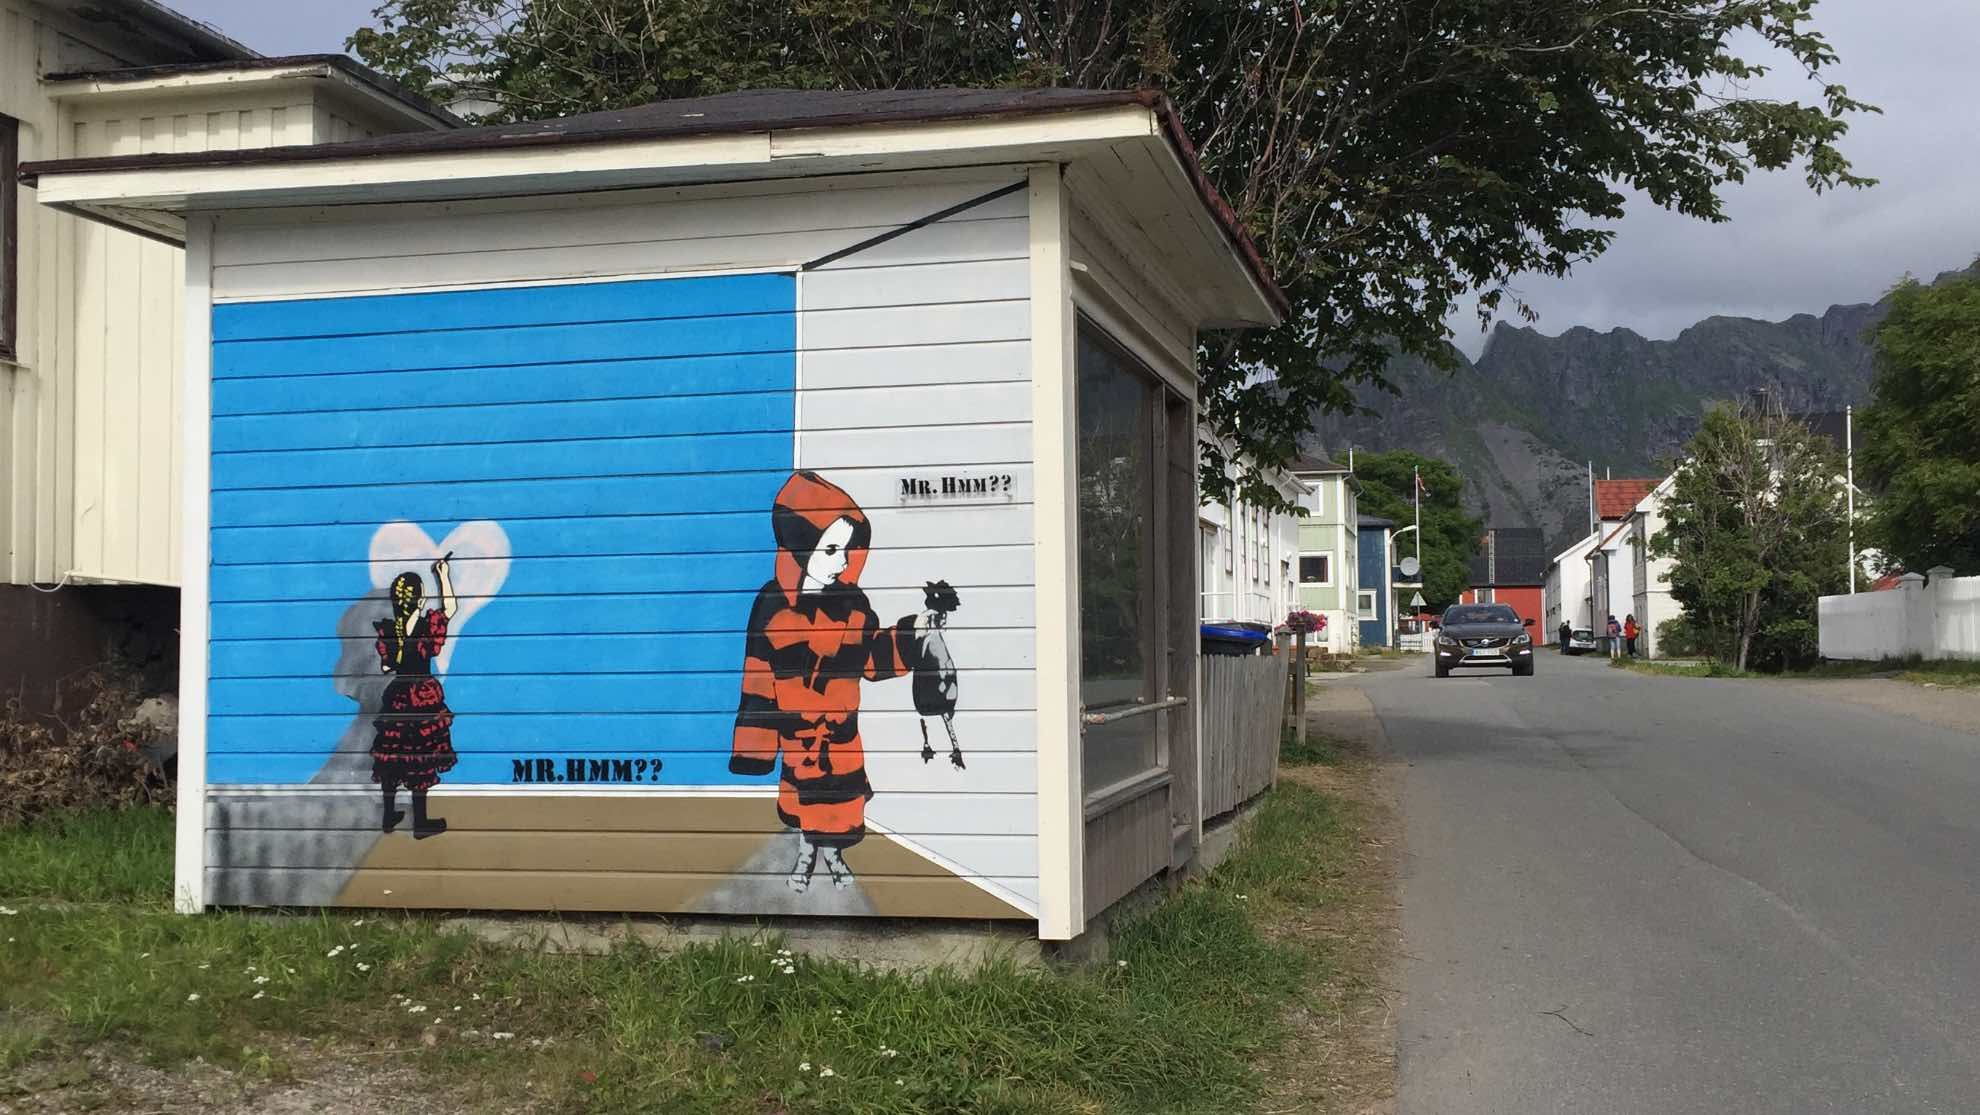 Straßenkunst.